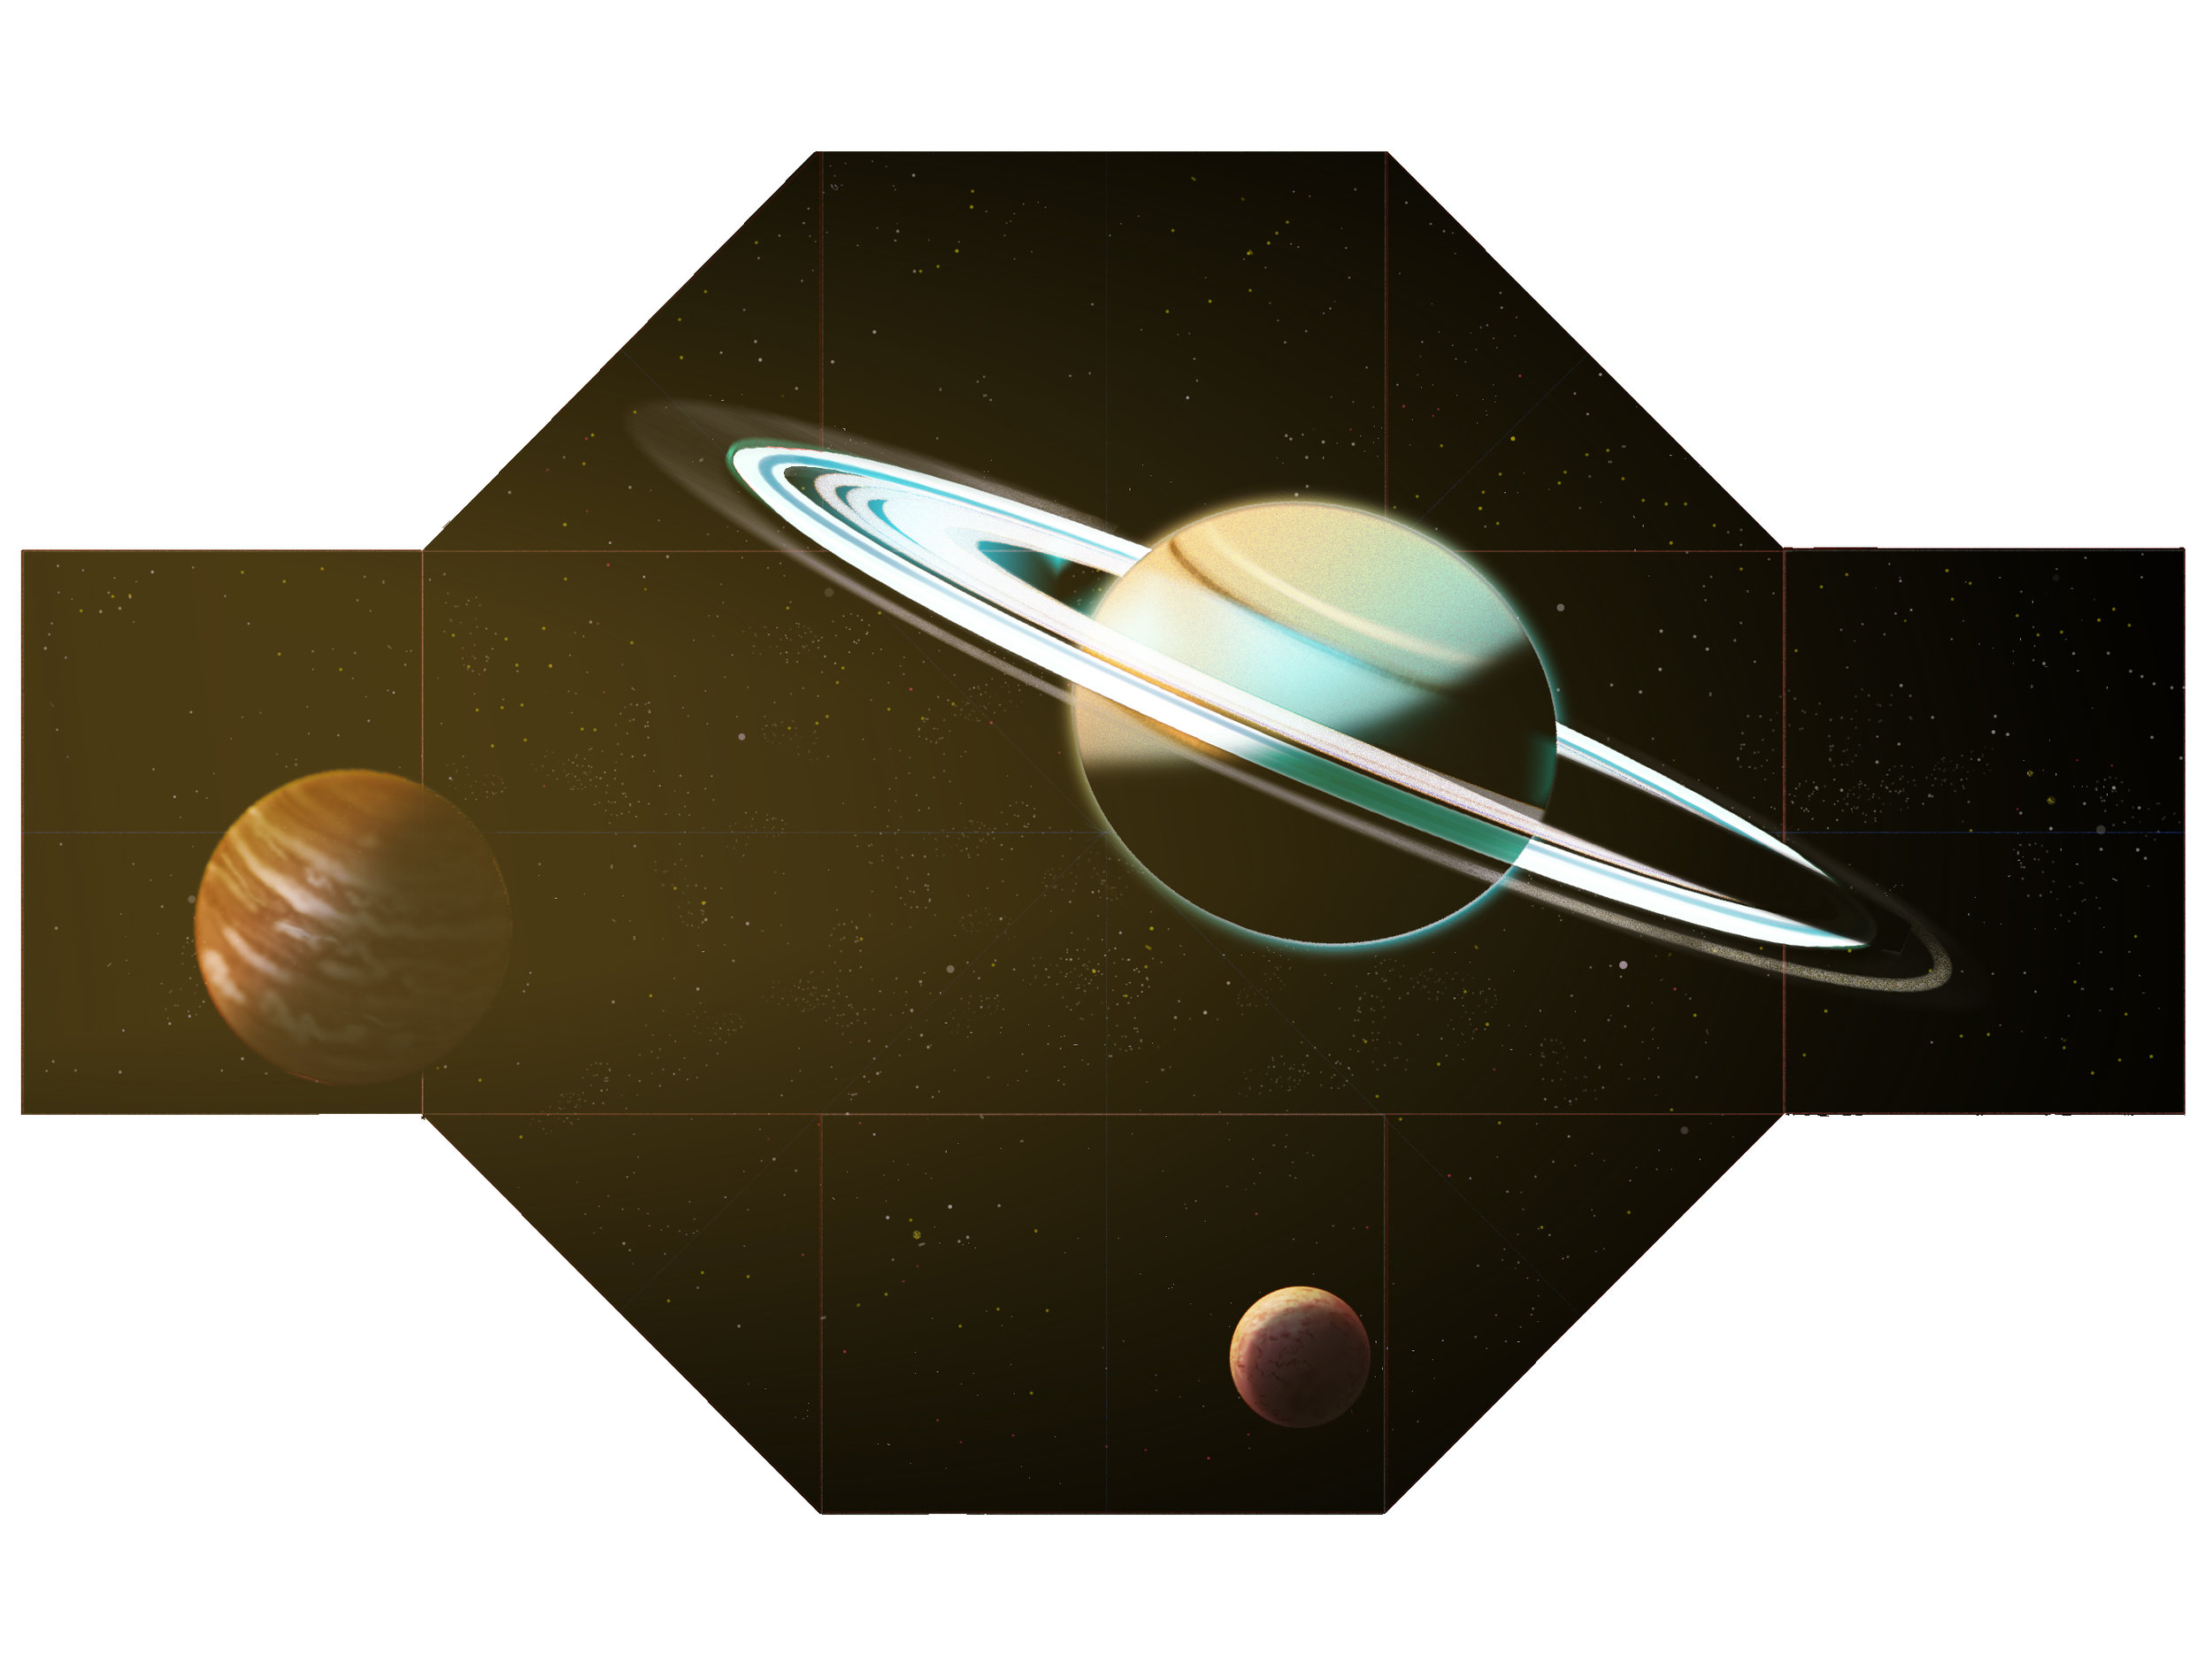 CaseStudySpheres_09.jpg